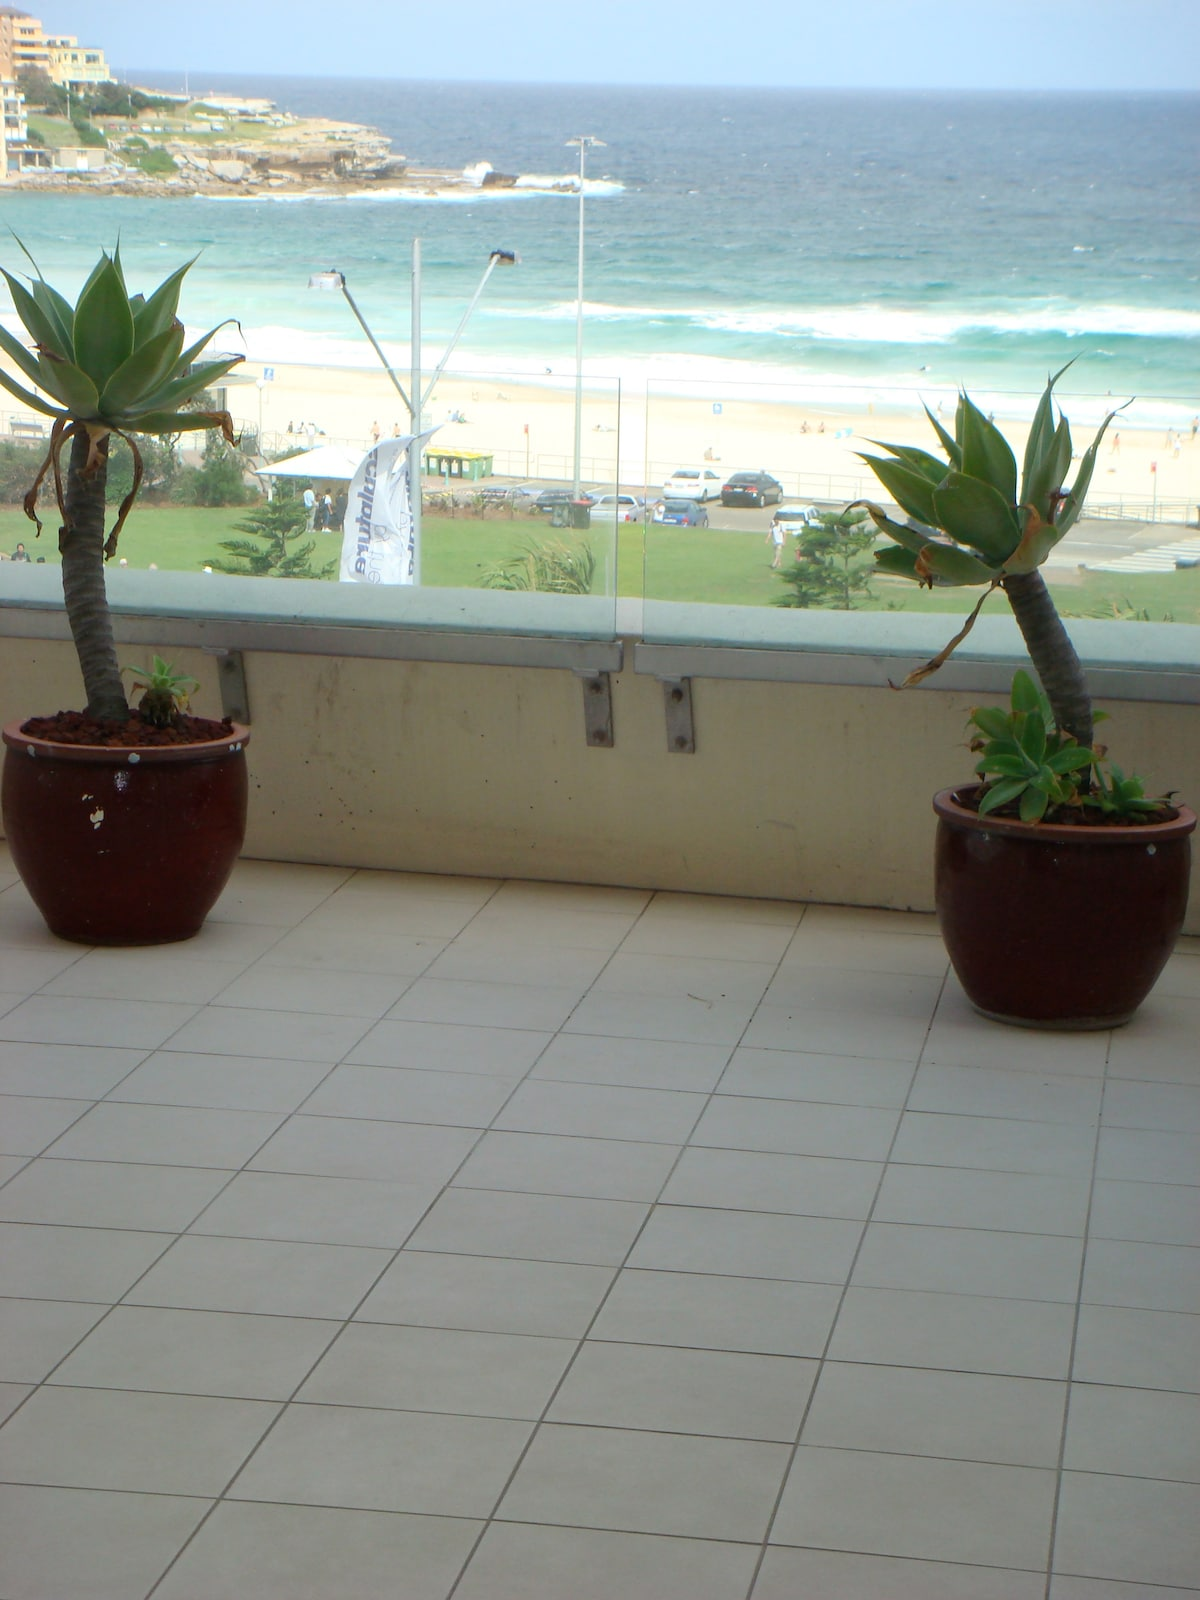 Jan From Bondi Beach, Australia